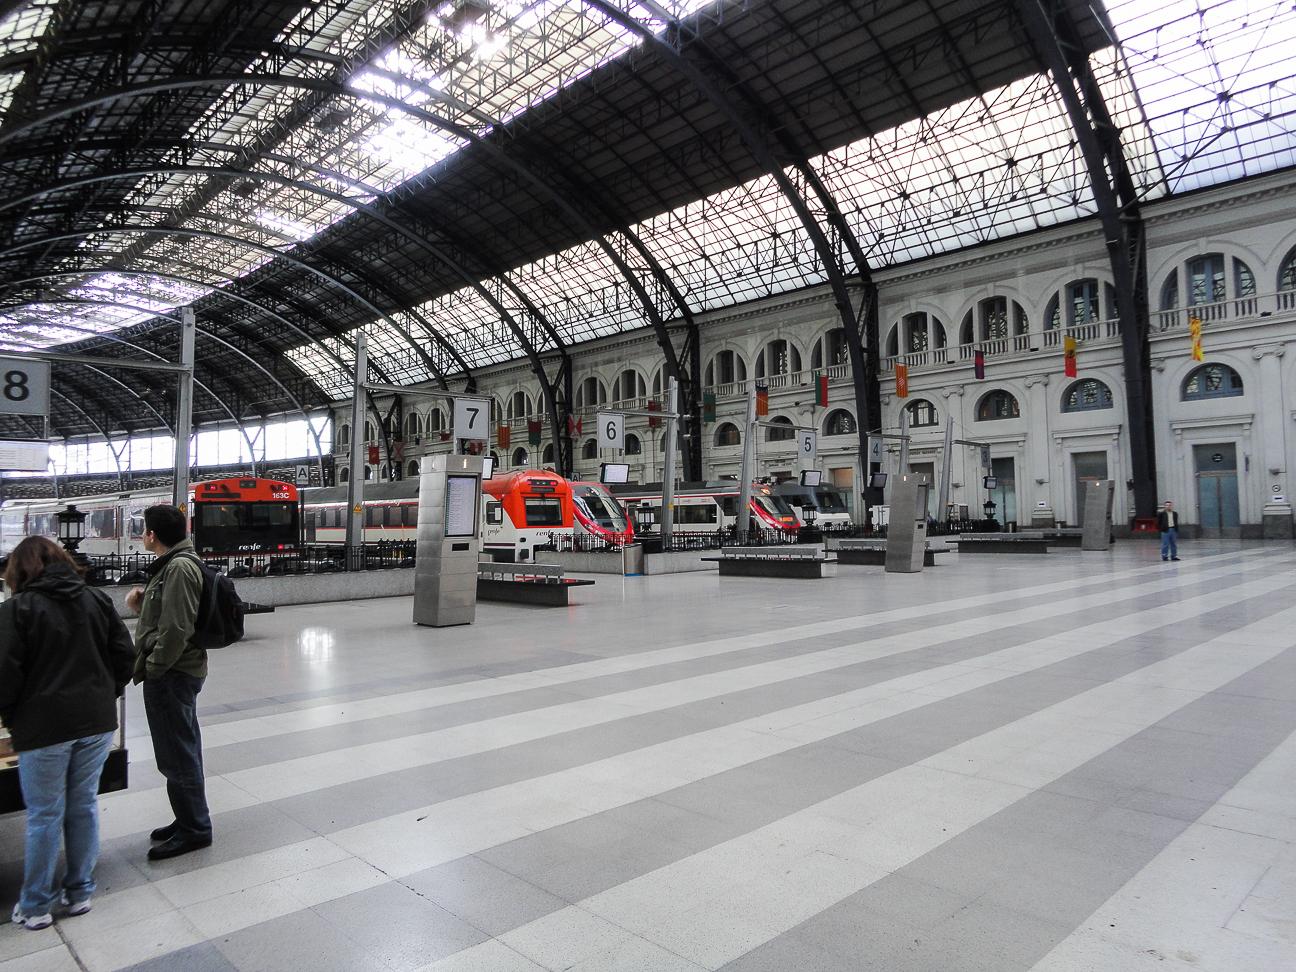 Estacion de Francia Tren Barcelona